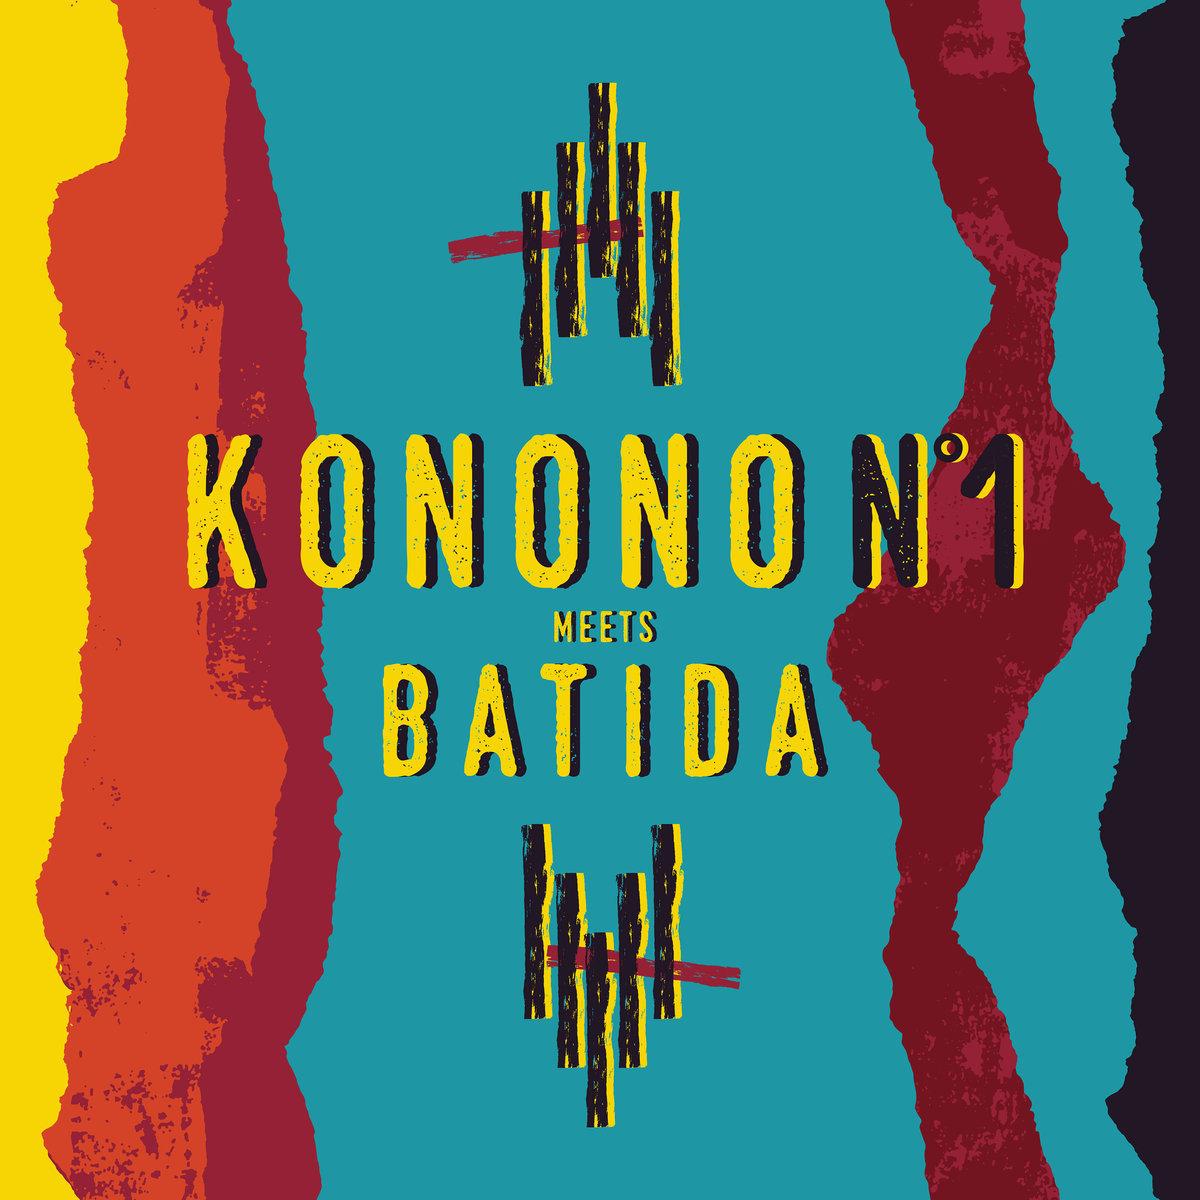 Bandcamp pick of the week: Konono N°1 meets Batida